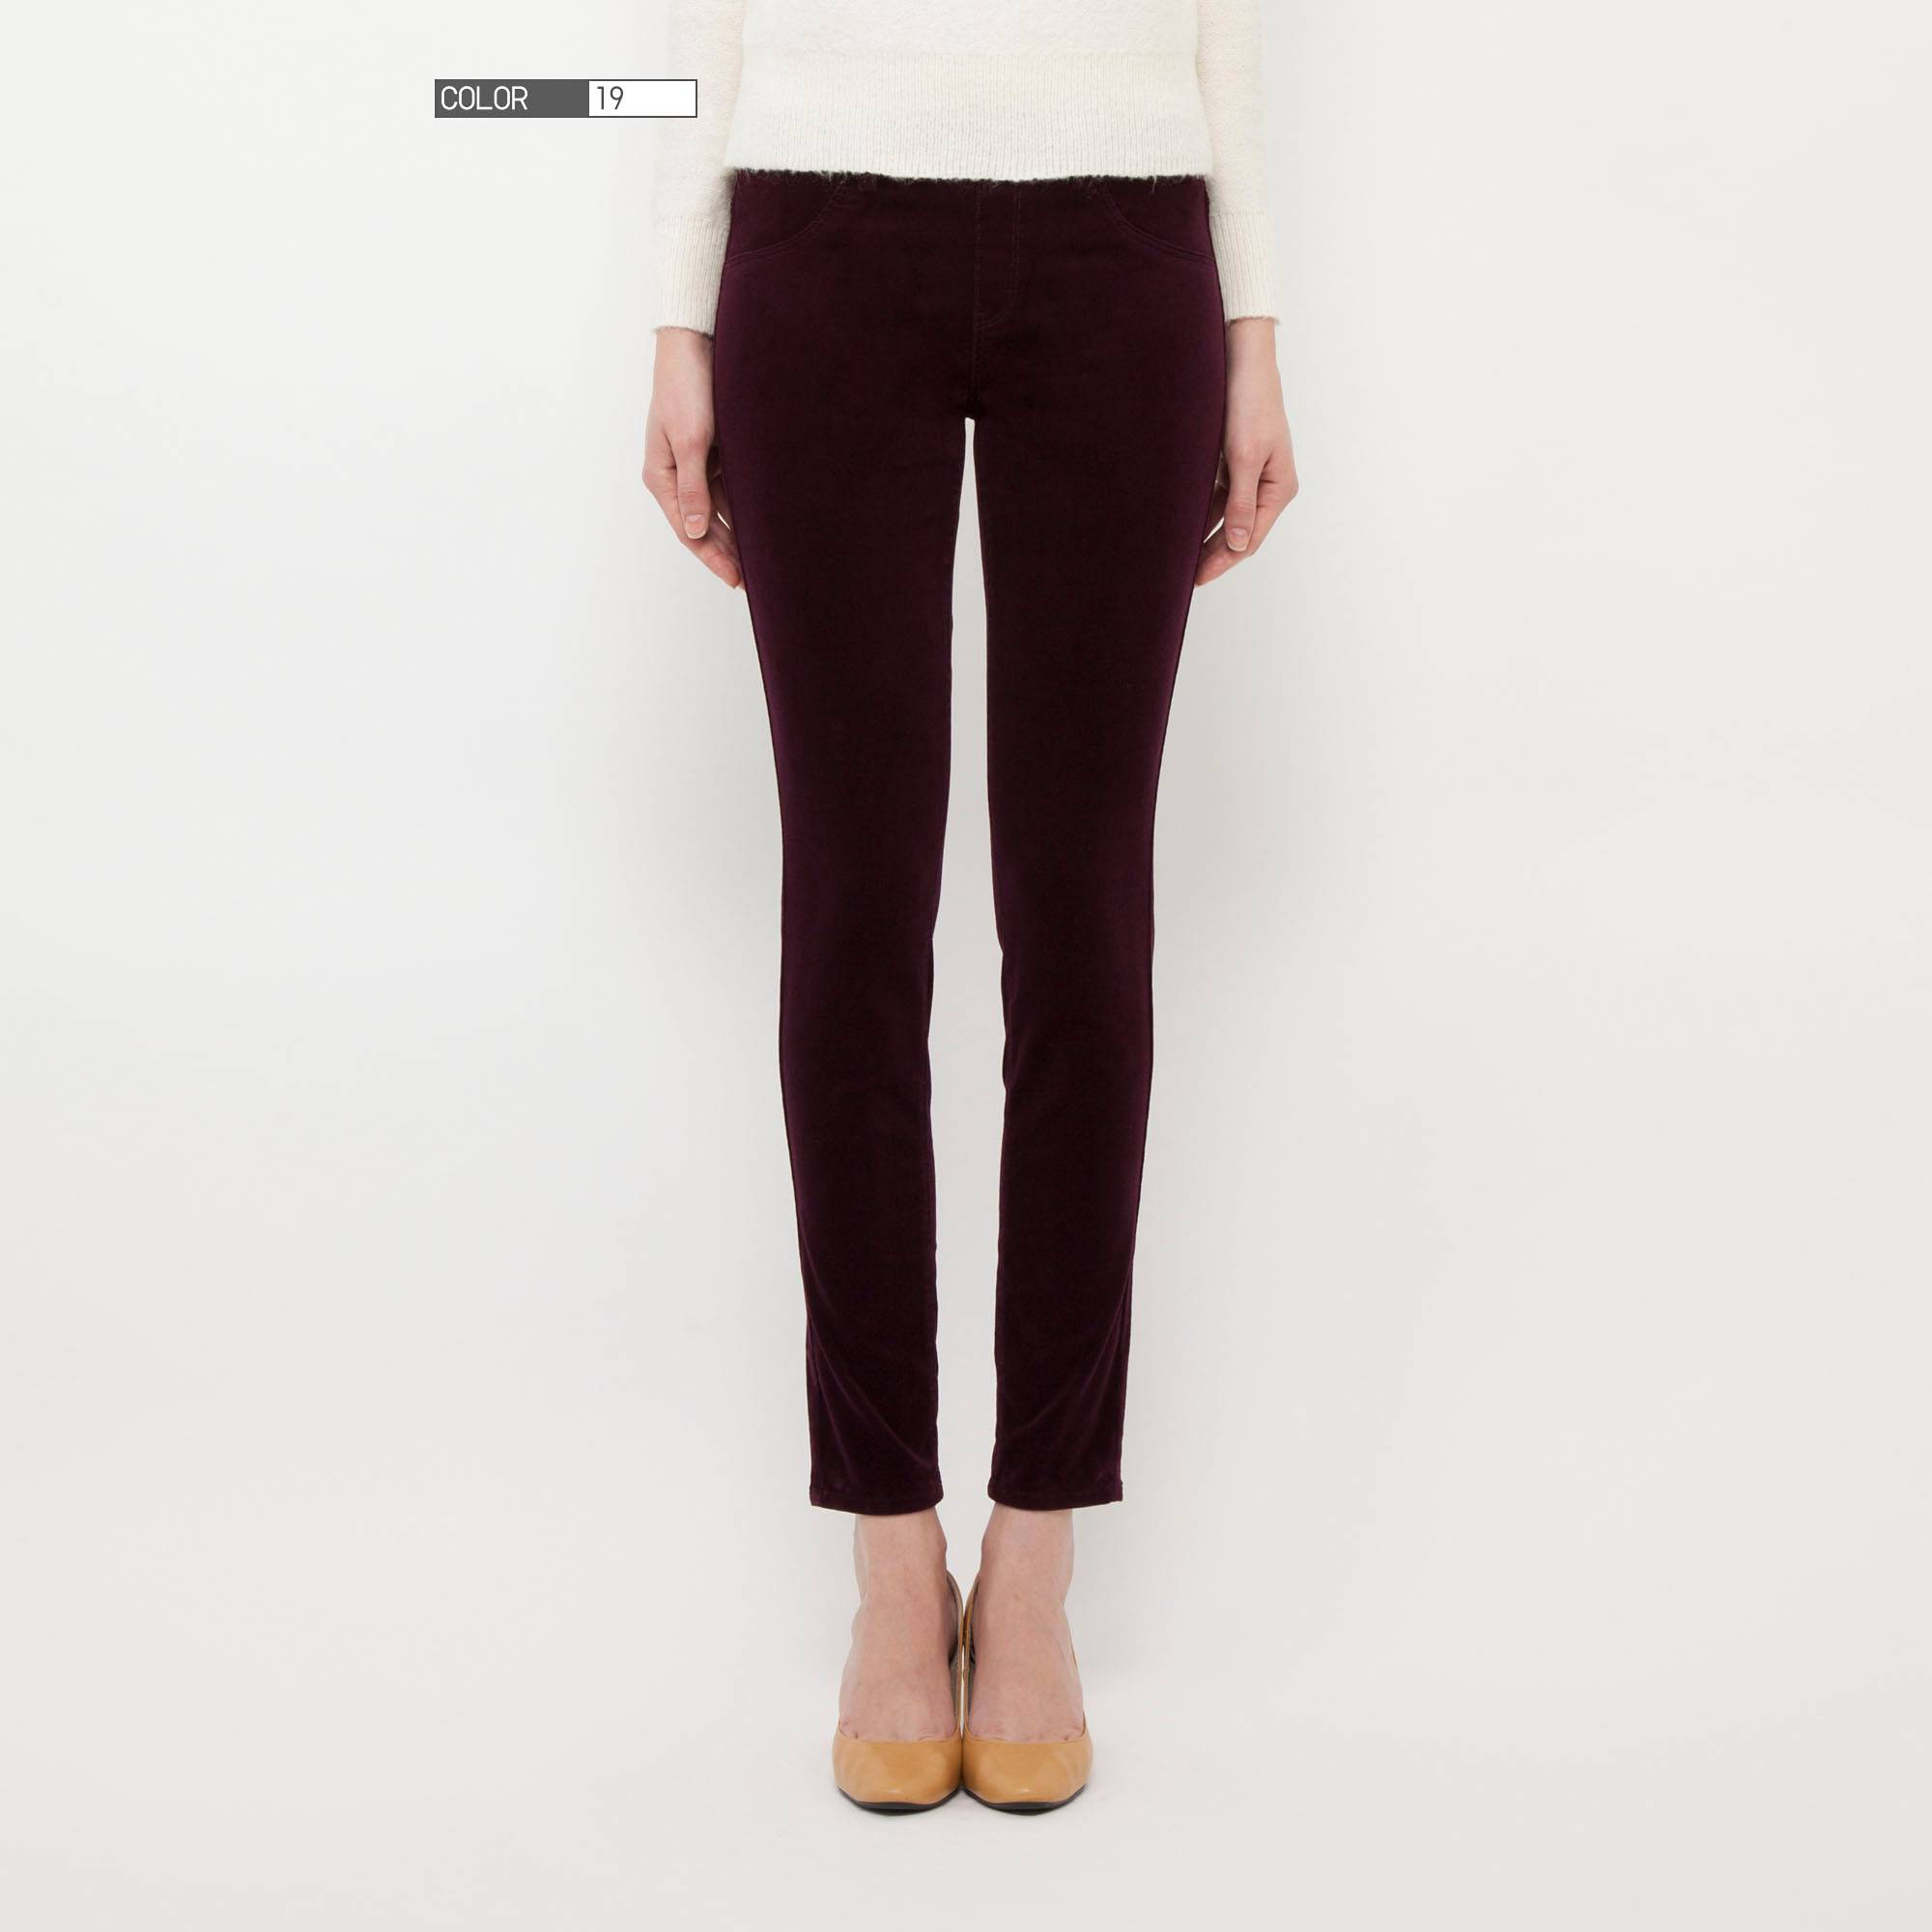 Brown Corduroy Pants For Women